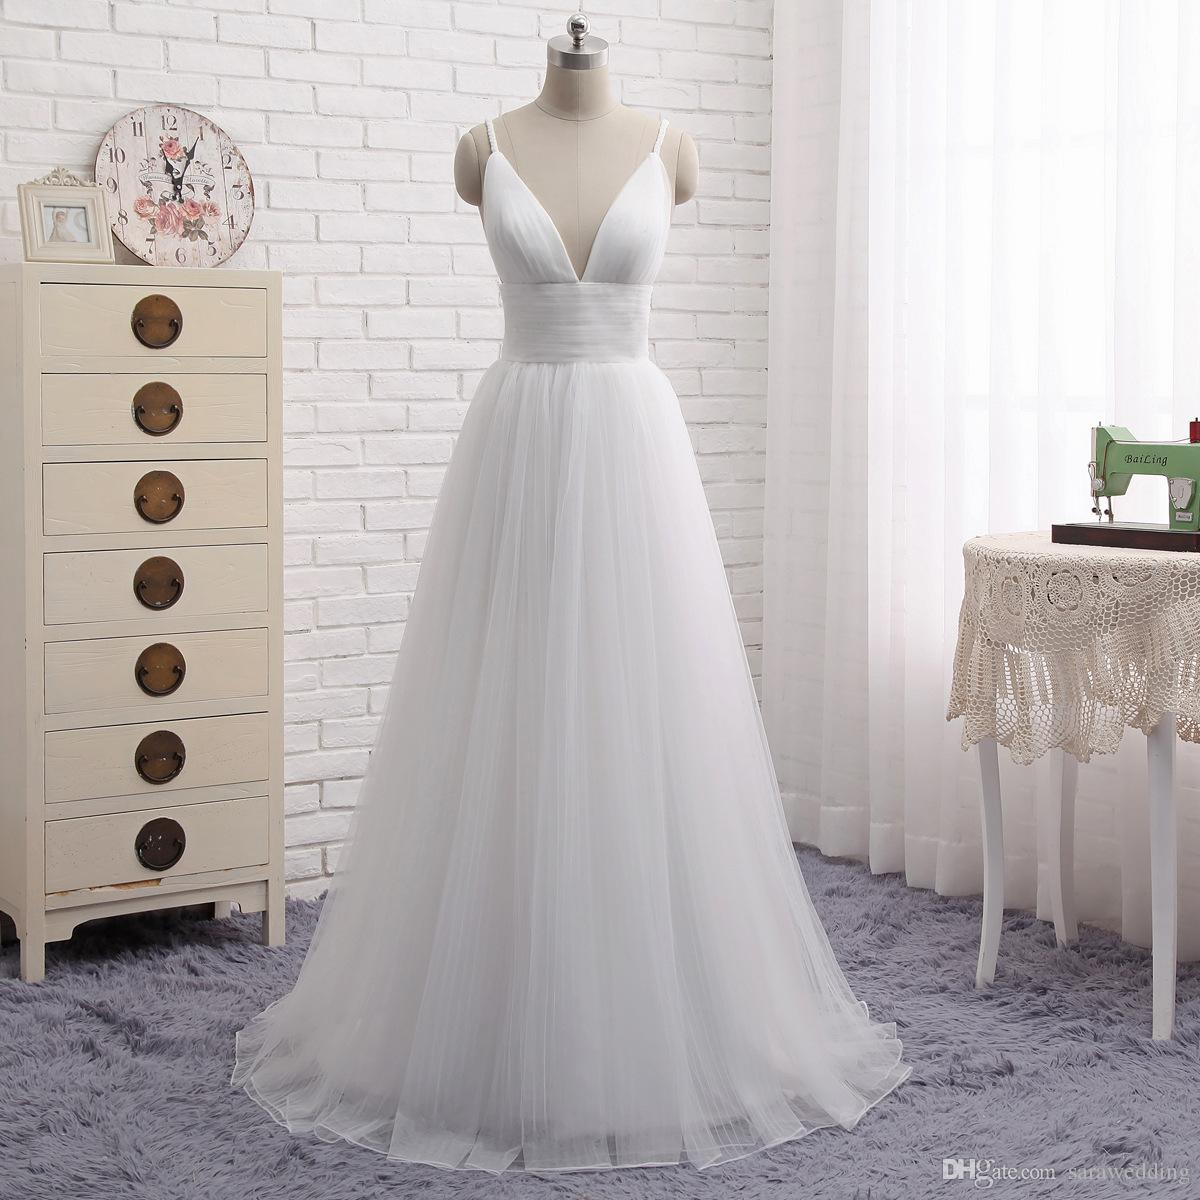 Spaghetti V Neck Tulle Vestido De Noiva Praia 2019 Sexy Vestidos De Casamento Branco Marfim Vestidos De Noiva Até O Chão